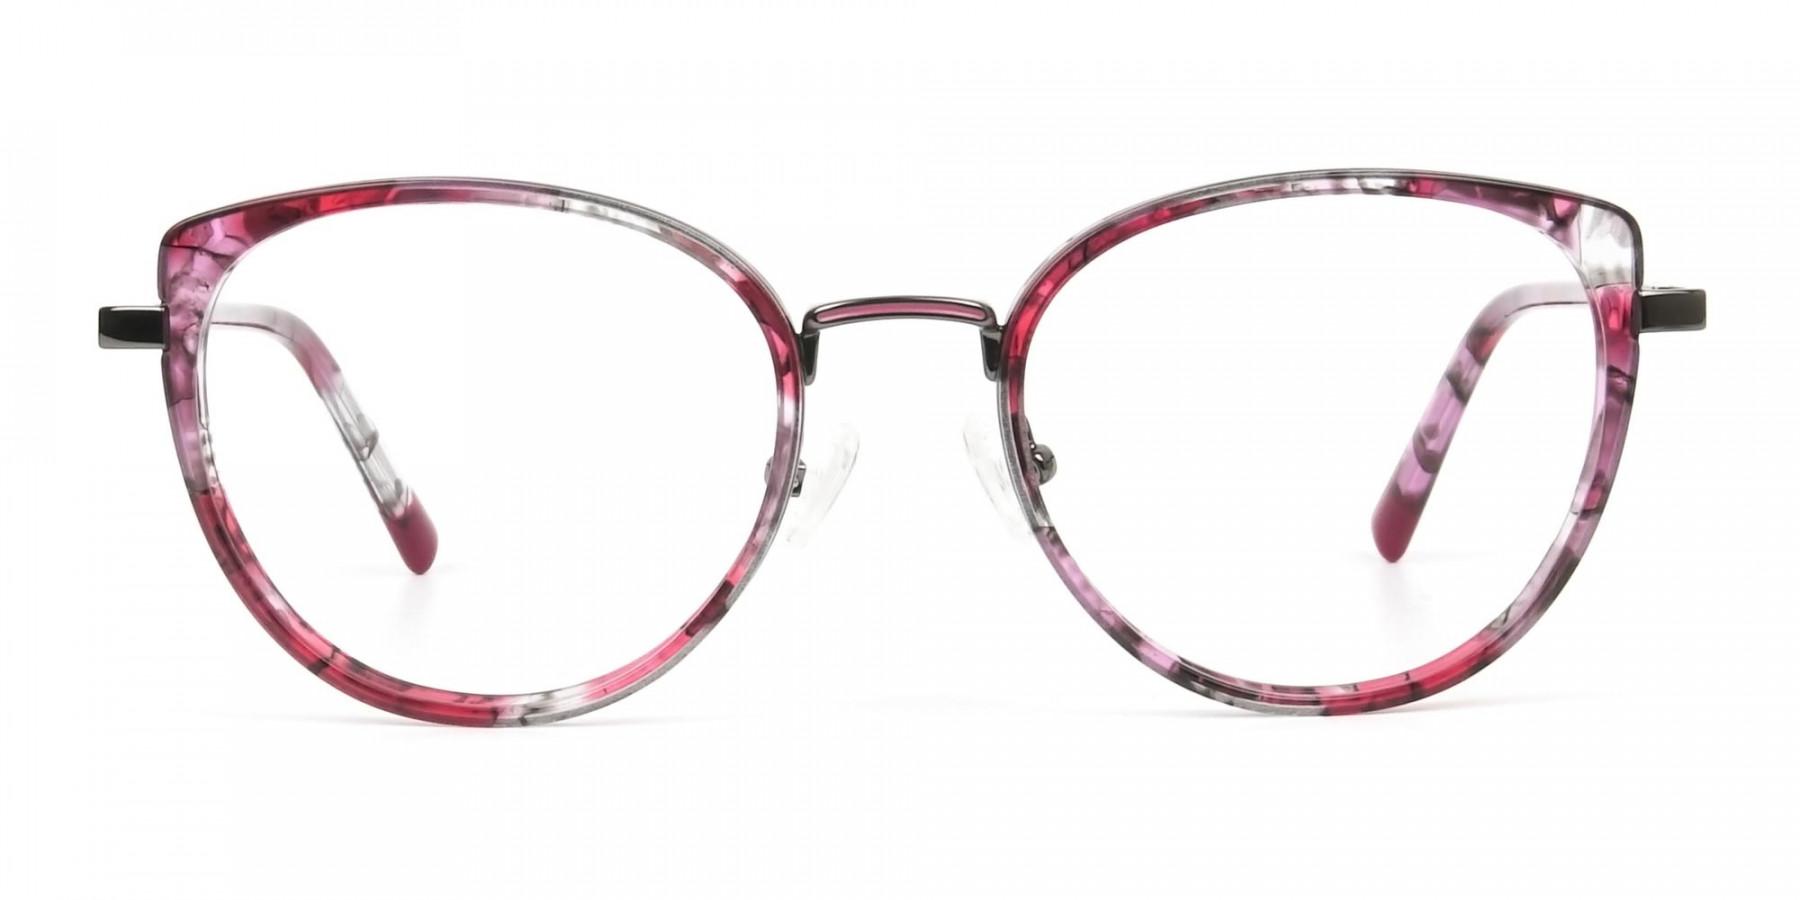 Red Tortoise Cat-Eye Glasses in Round - 1